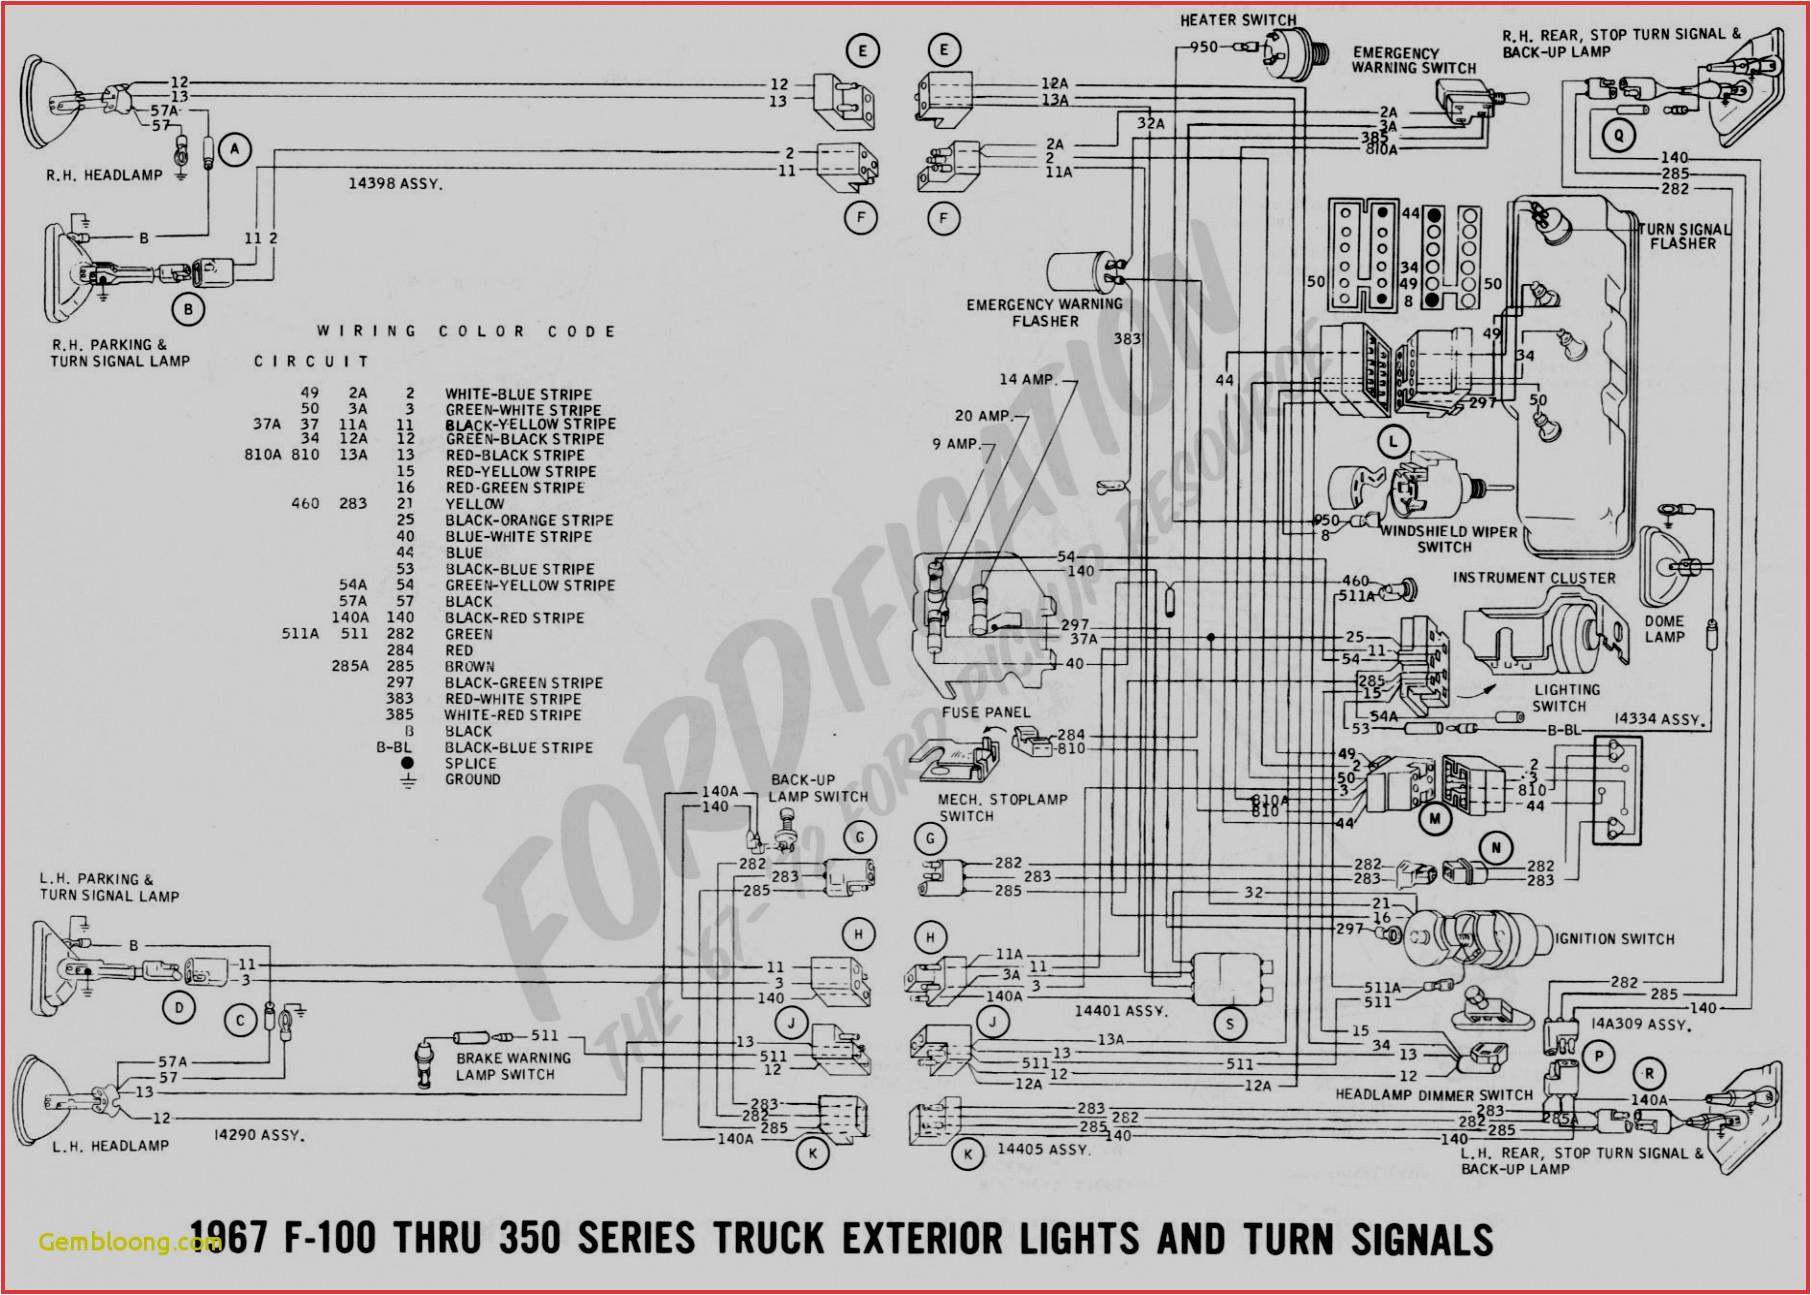 wiring diagram for trailer brakes download ford trucks wiring diagrams ford f150 wiring diagrams best volvo